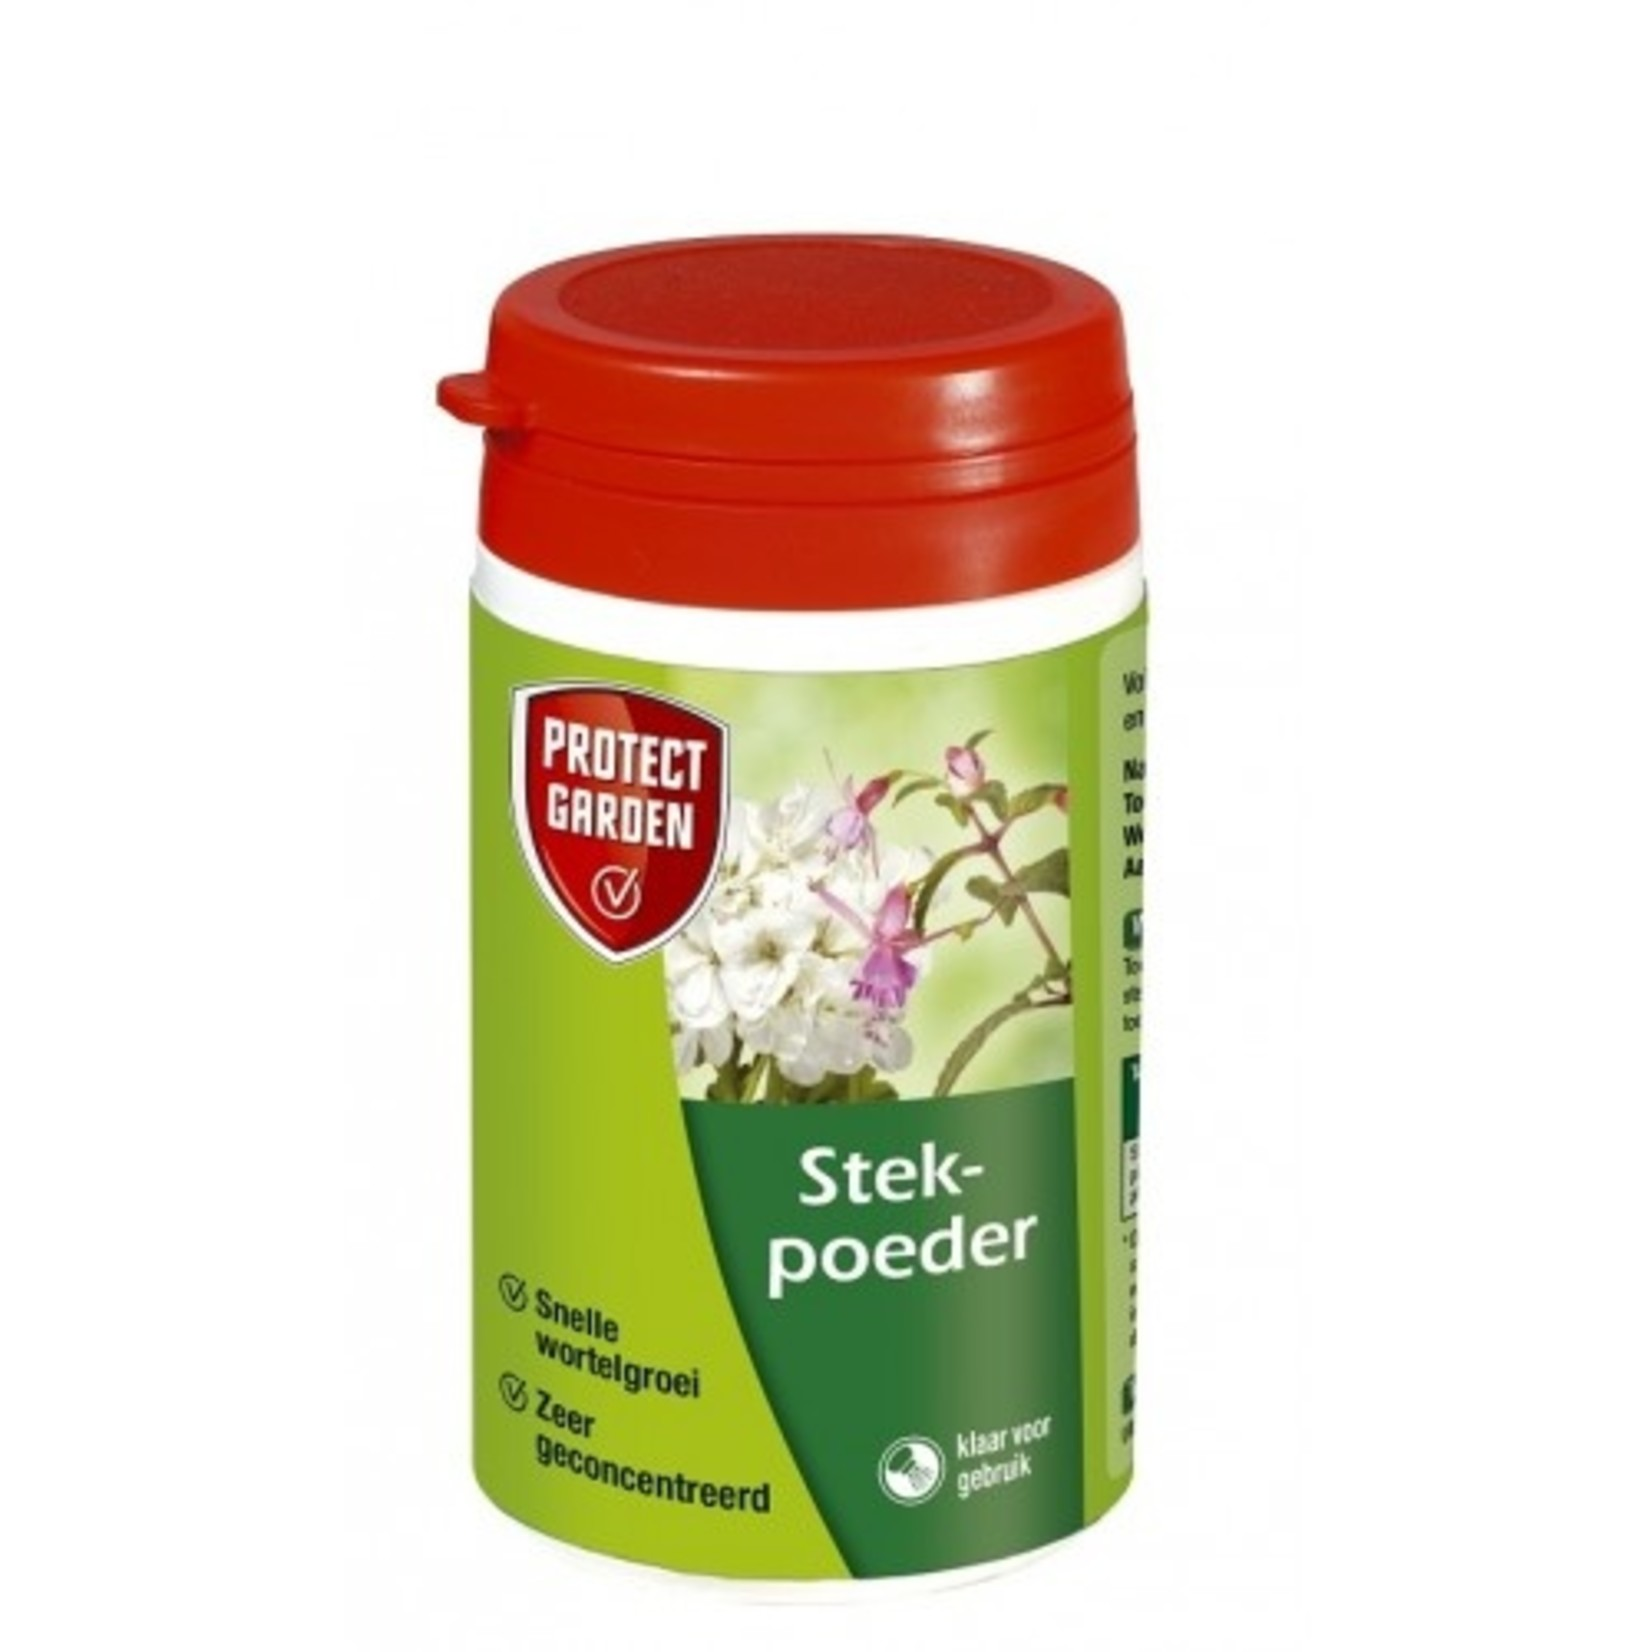 Protect Garden Stekmiddel  / Stekpoeder 25 gram